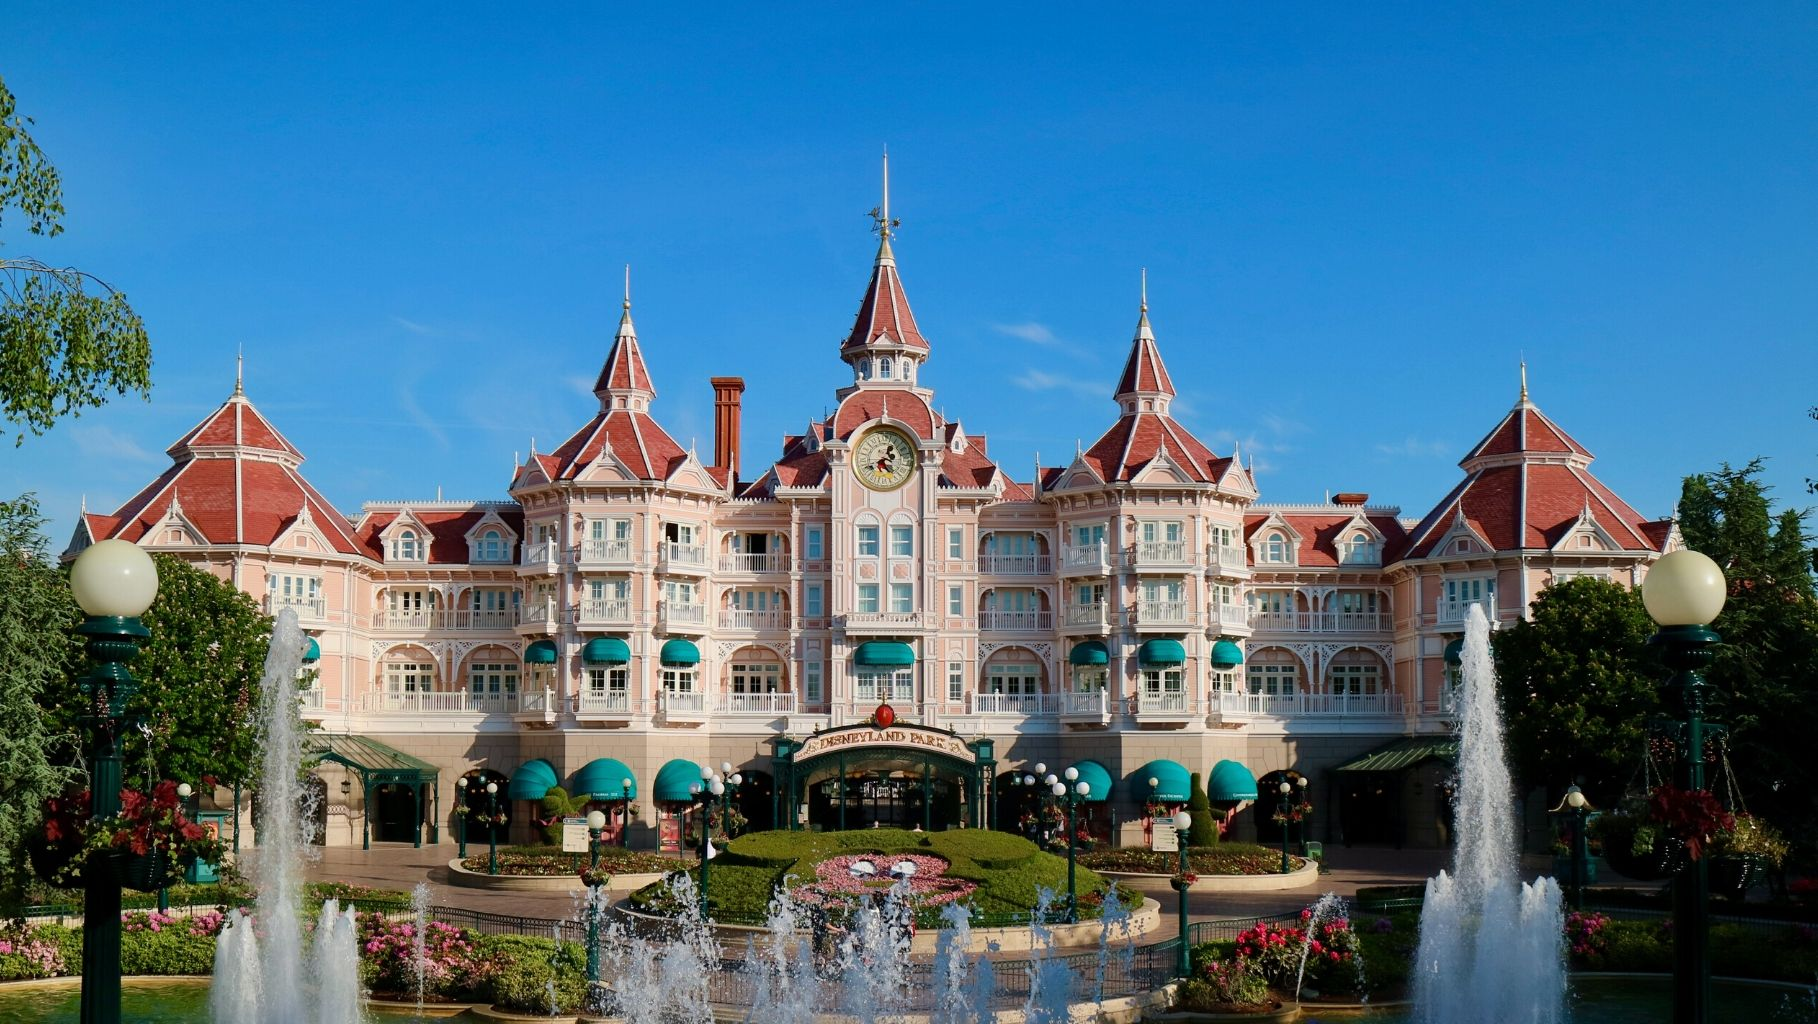 Hotel a Disneyland Paris